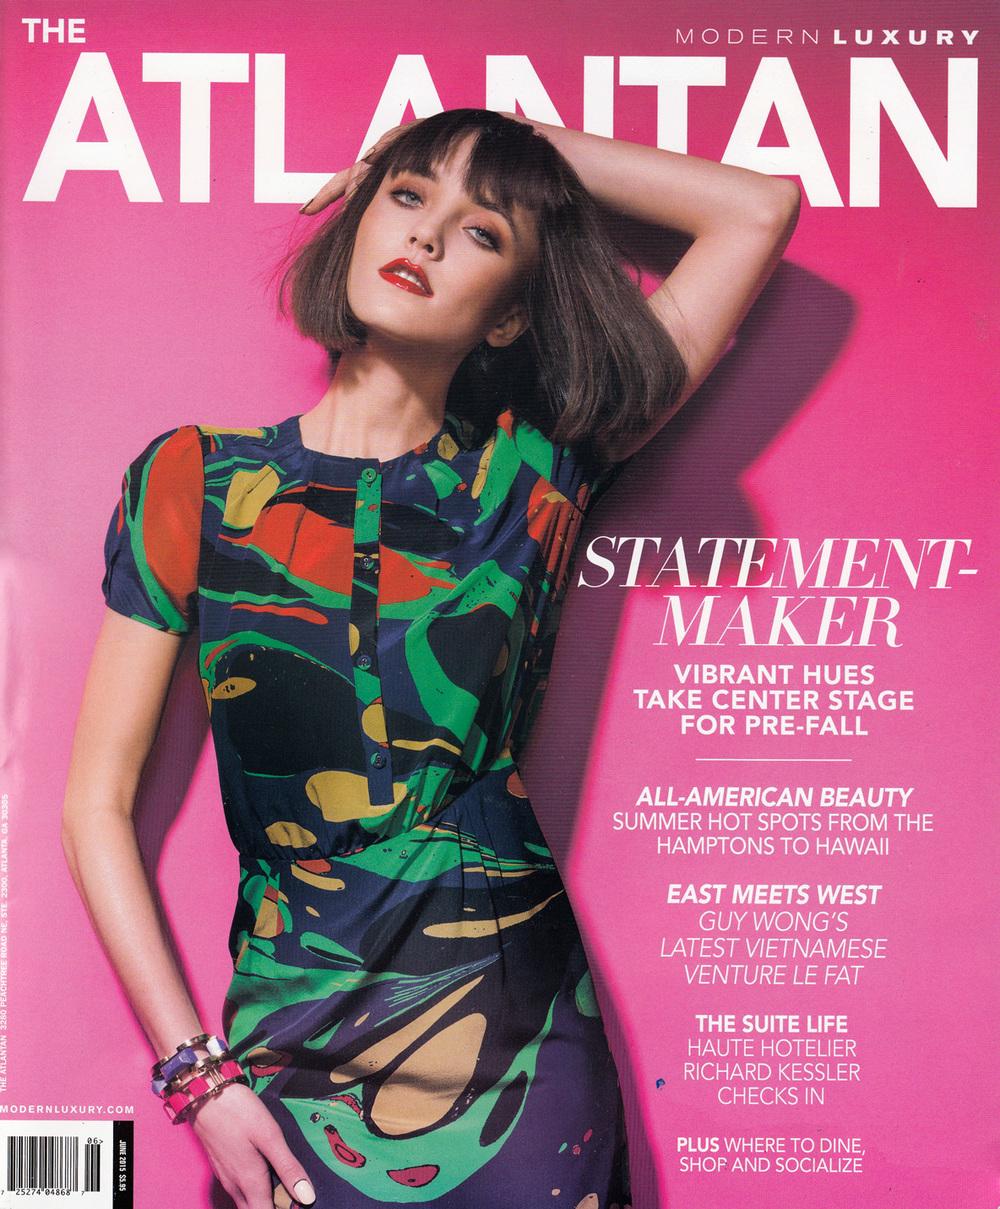 The-Atlantan-2015-06_01w.jpg